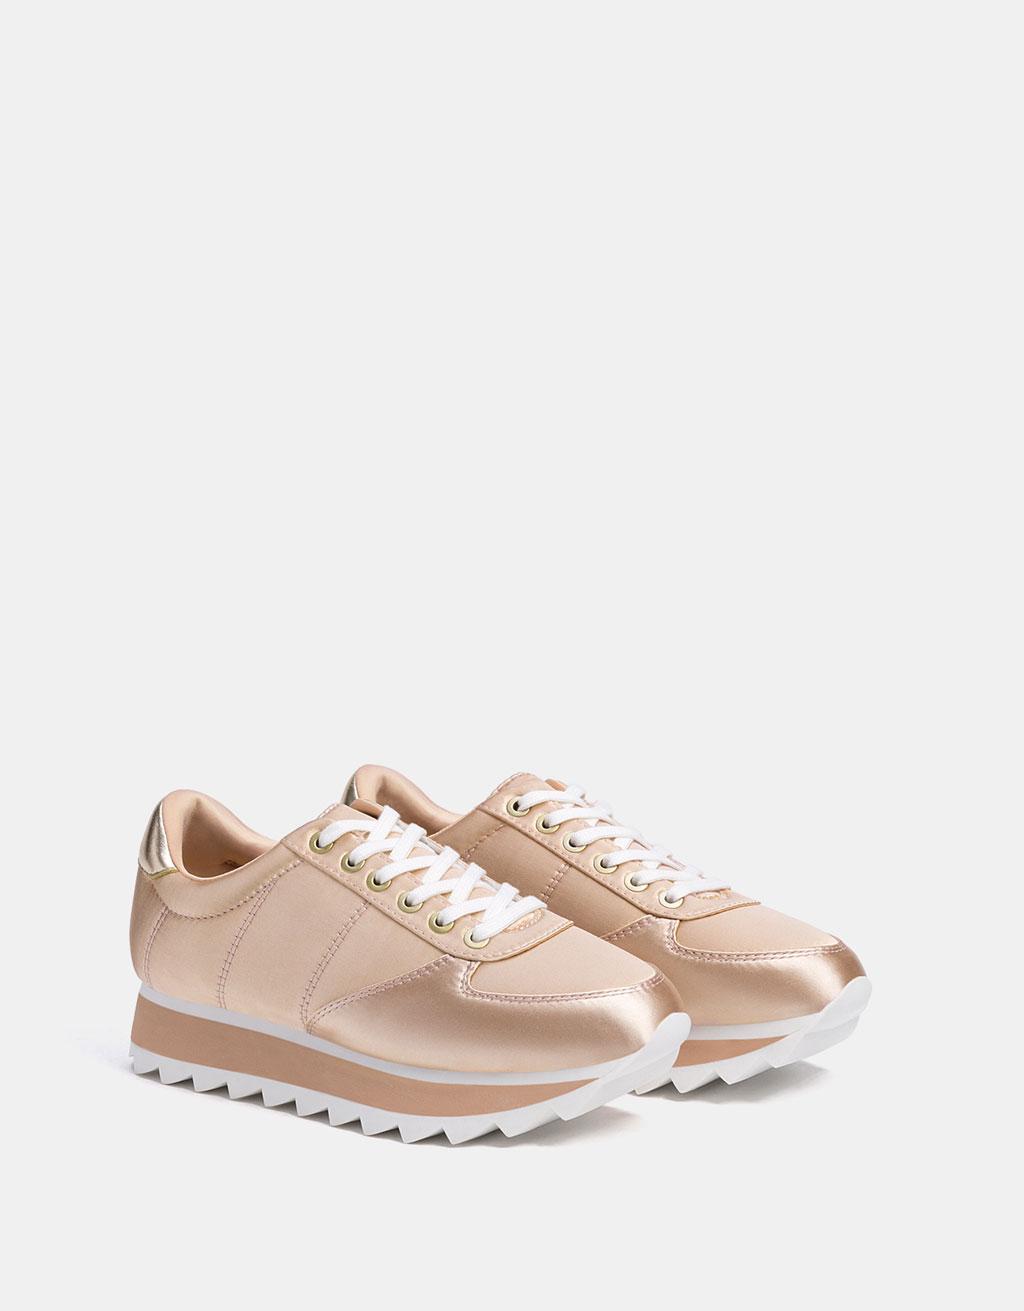 Satin platform sneakers